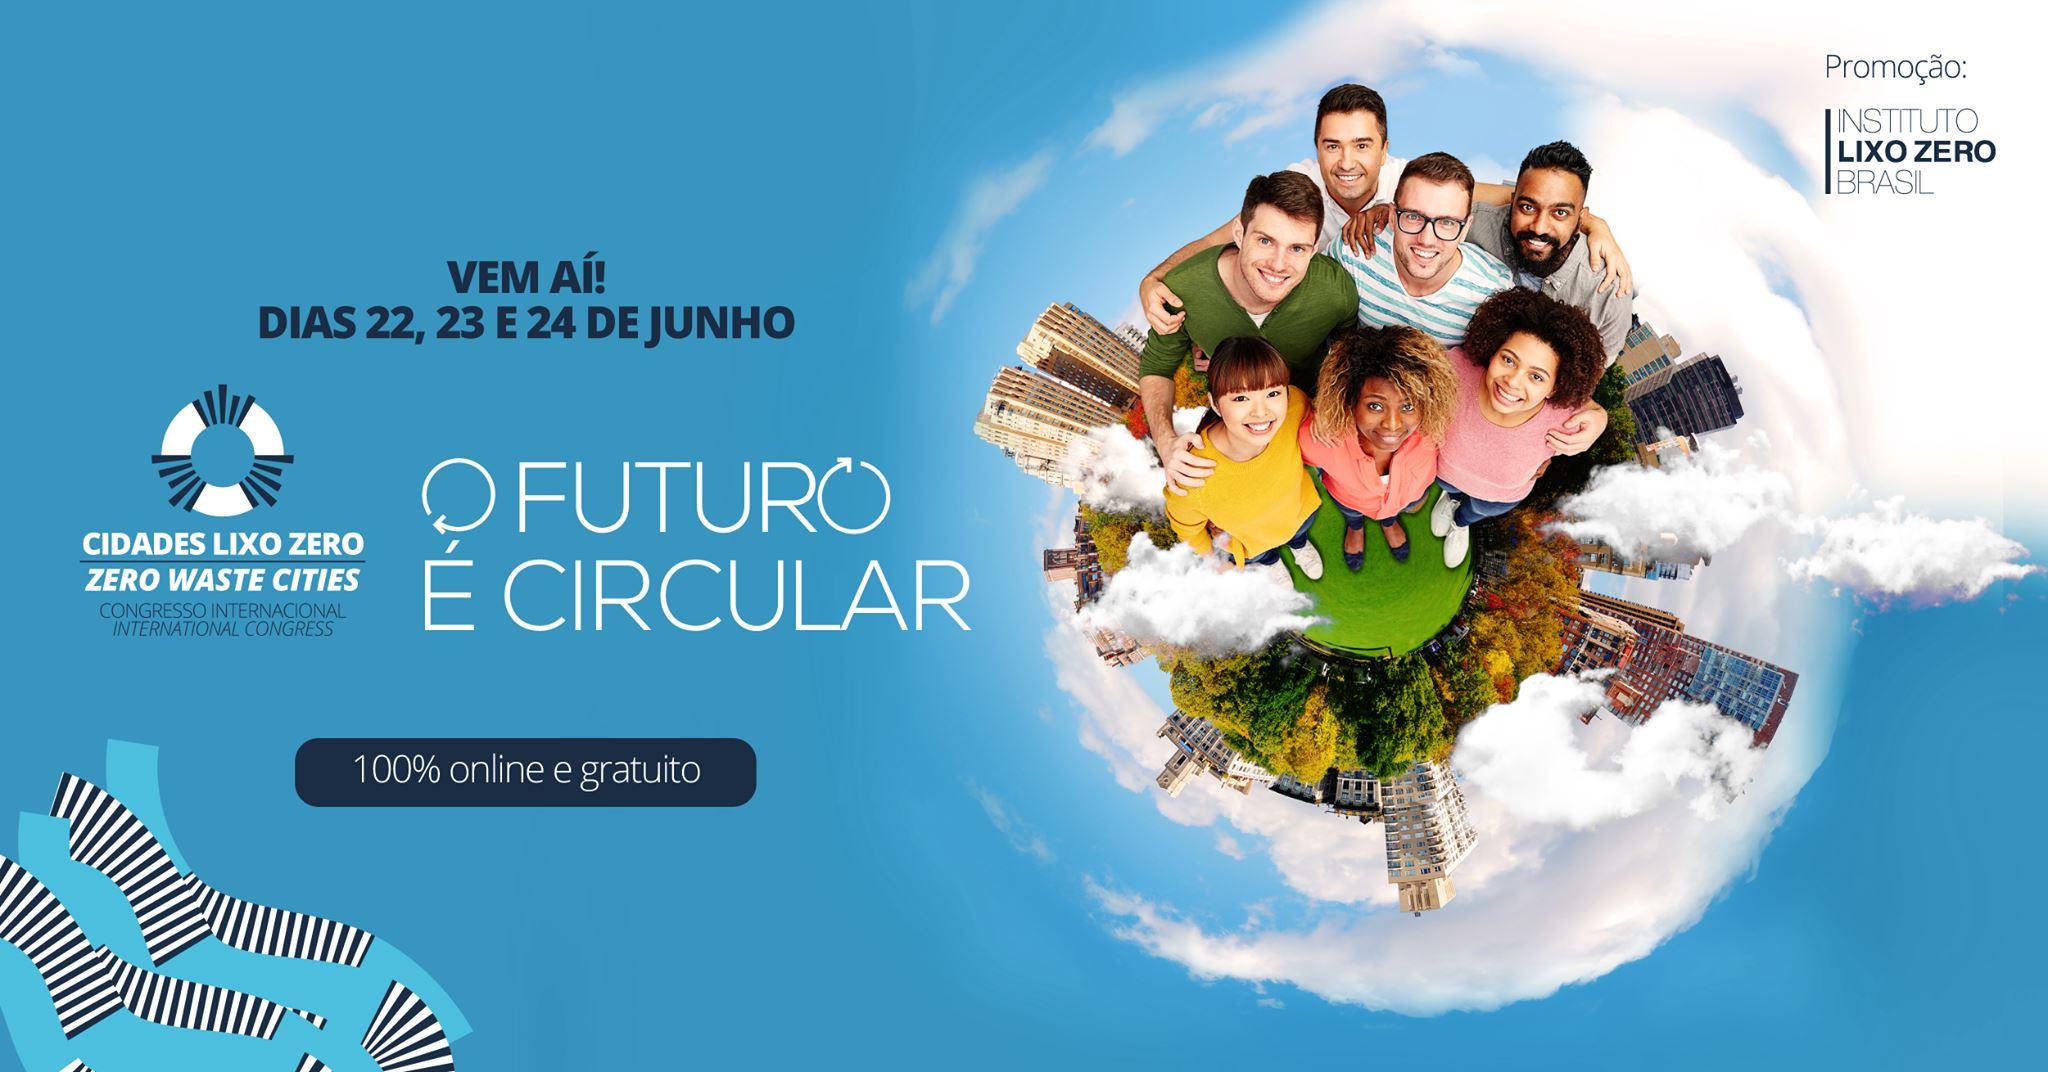 """Sustentabilidade"": Semasa Itajaí marca presença no Congresso Internacional Cidades Lixo Zero"